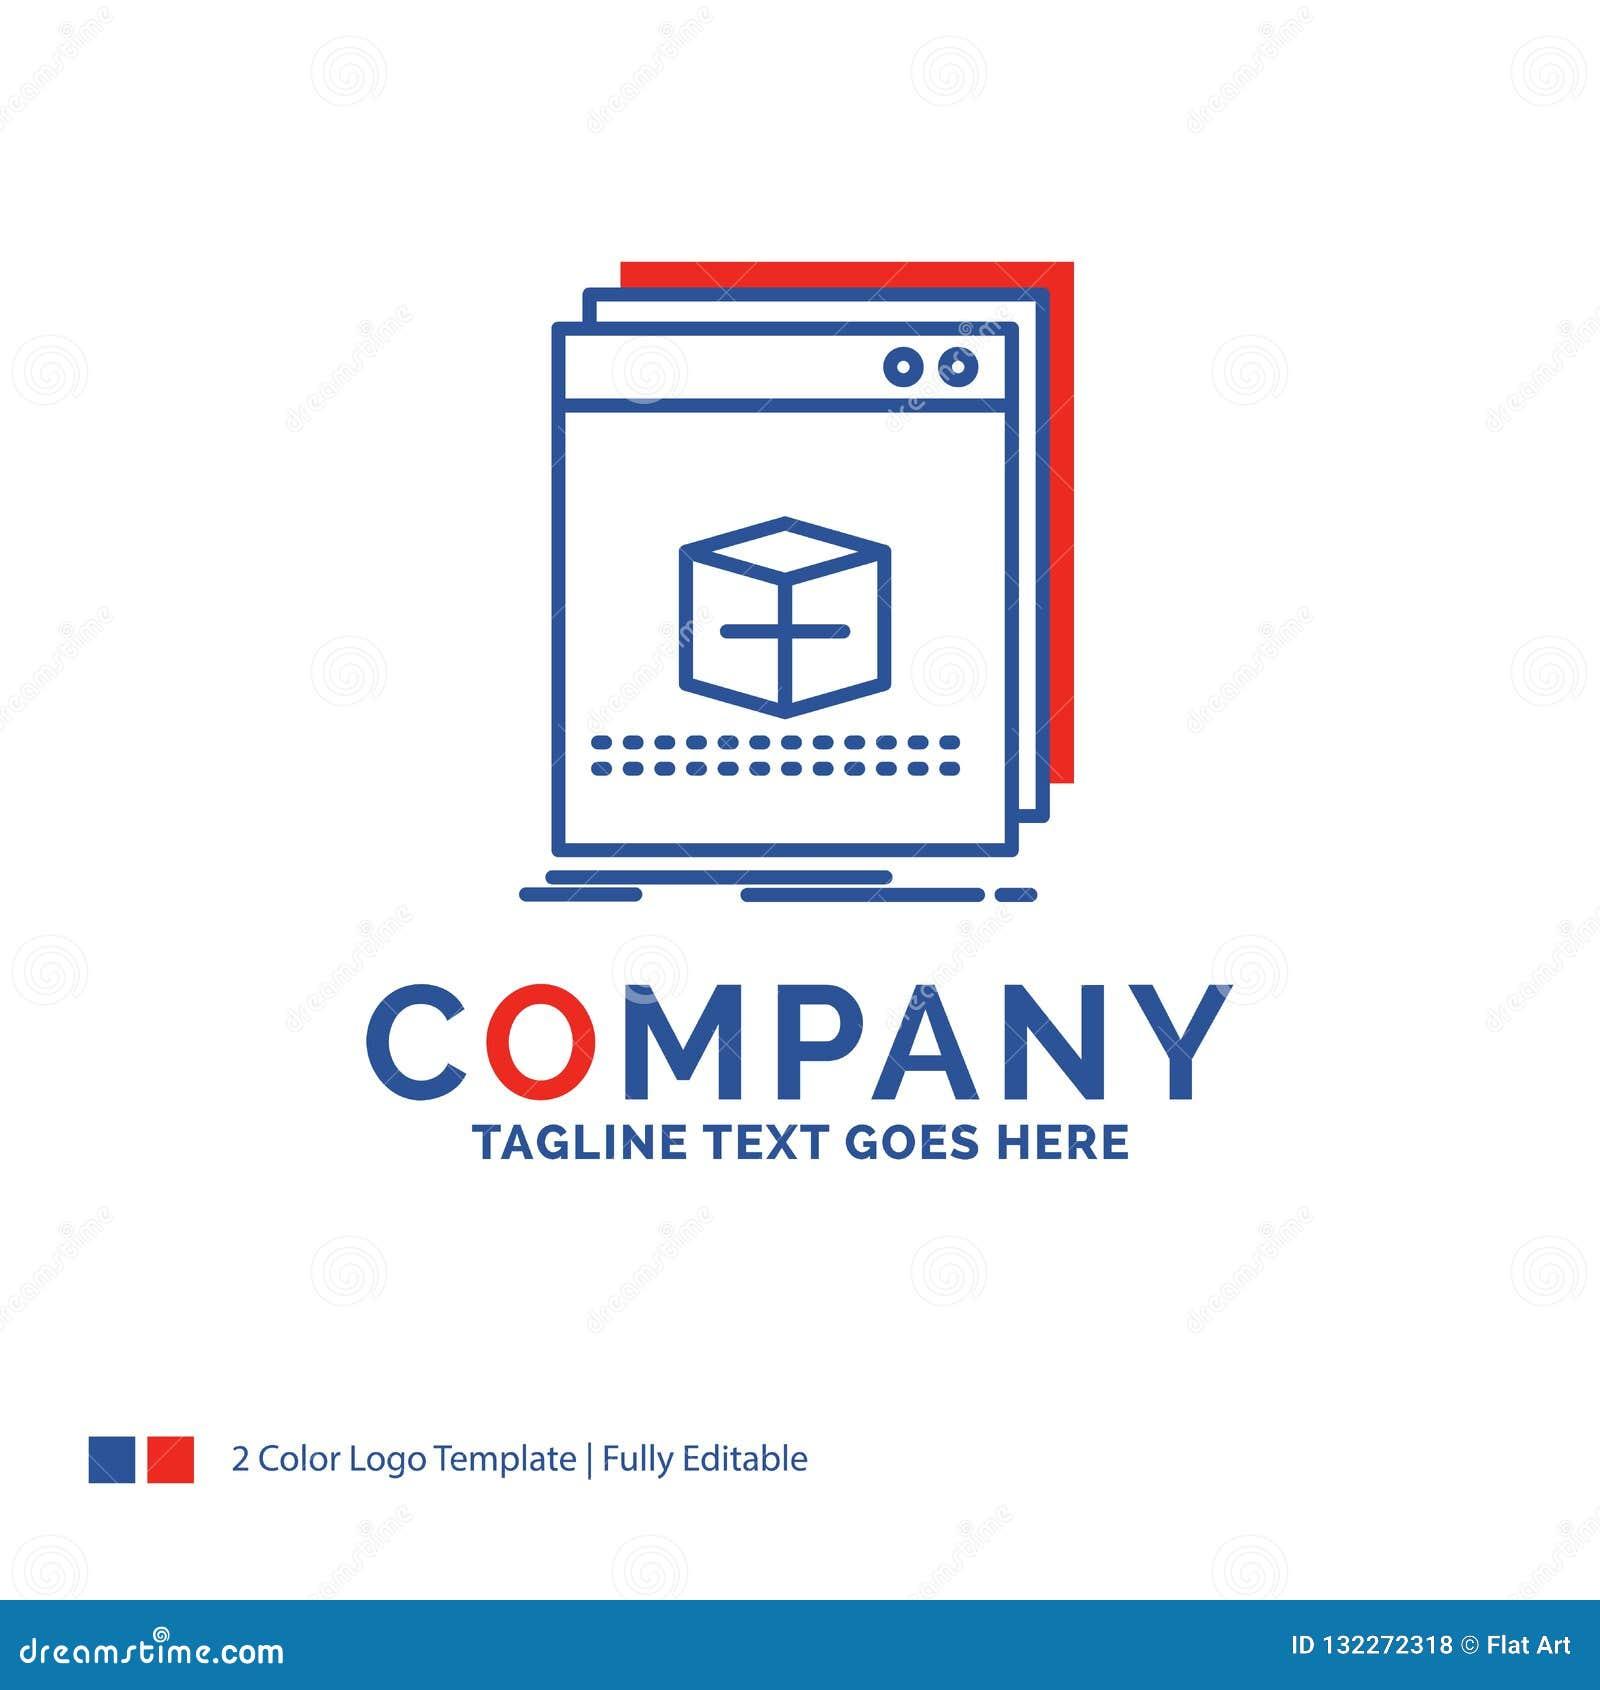 Company Name Logo Design For Software App Application File P Stock Vector Illustration Of Multimedia Document 132272318